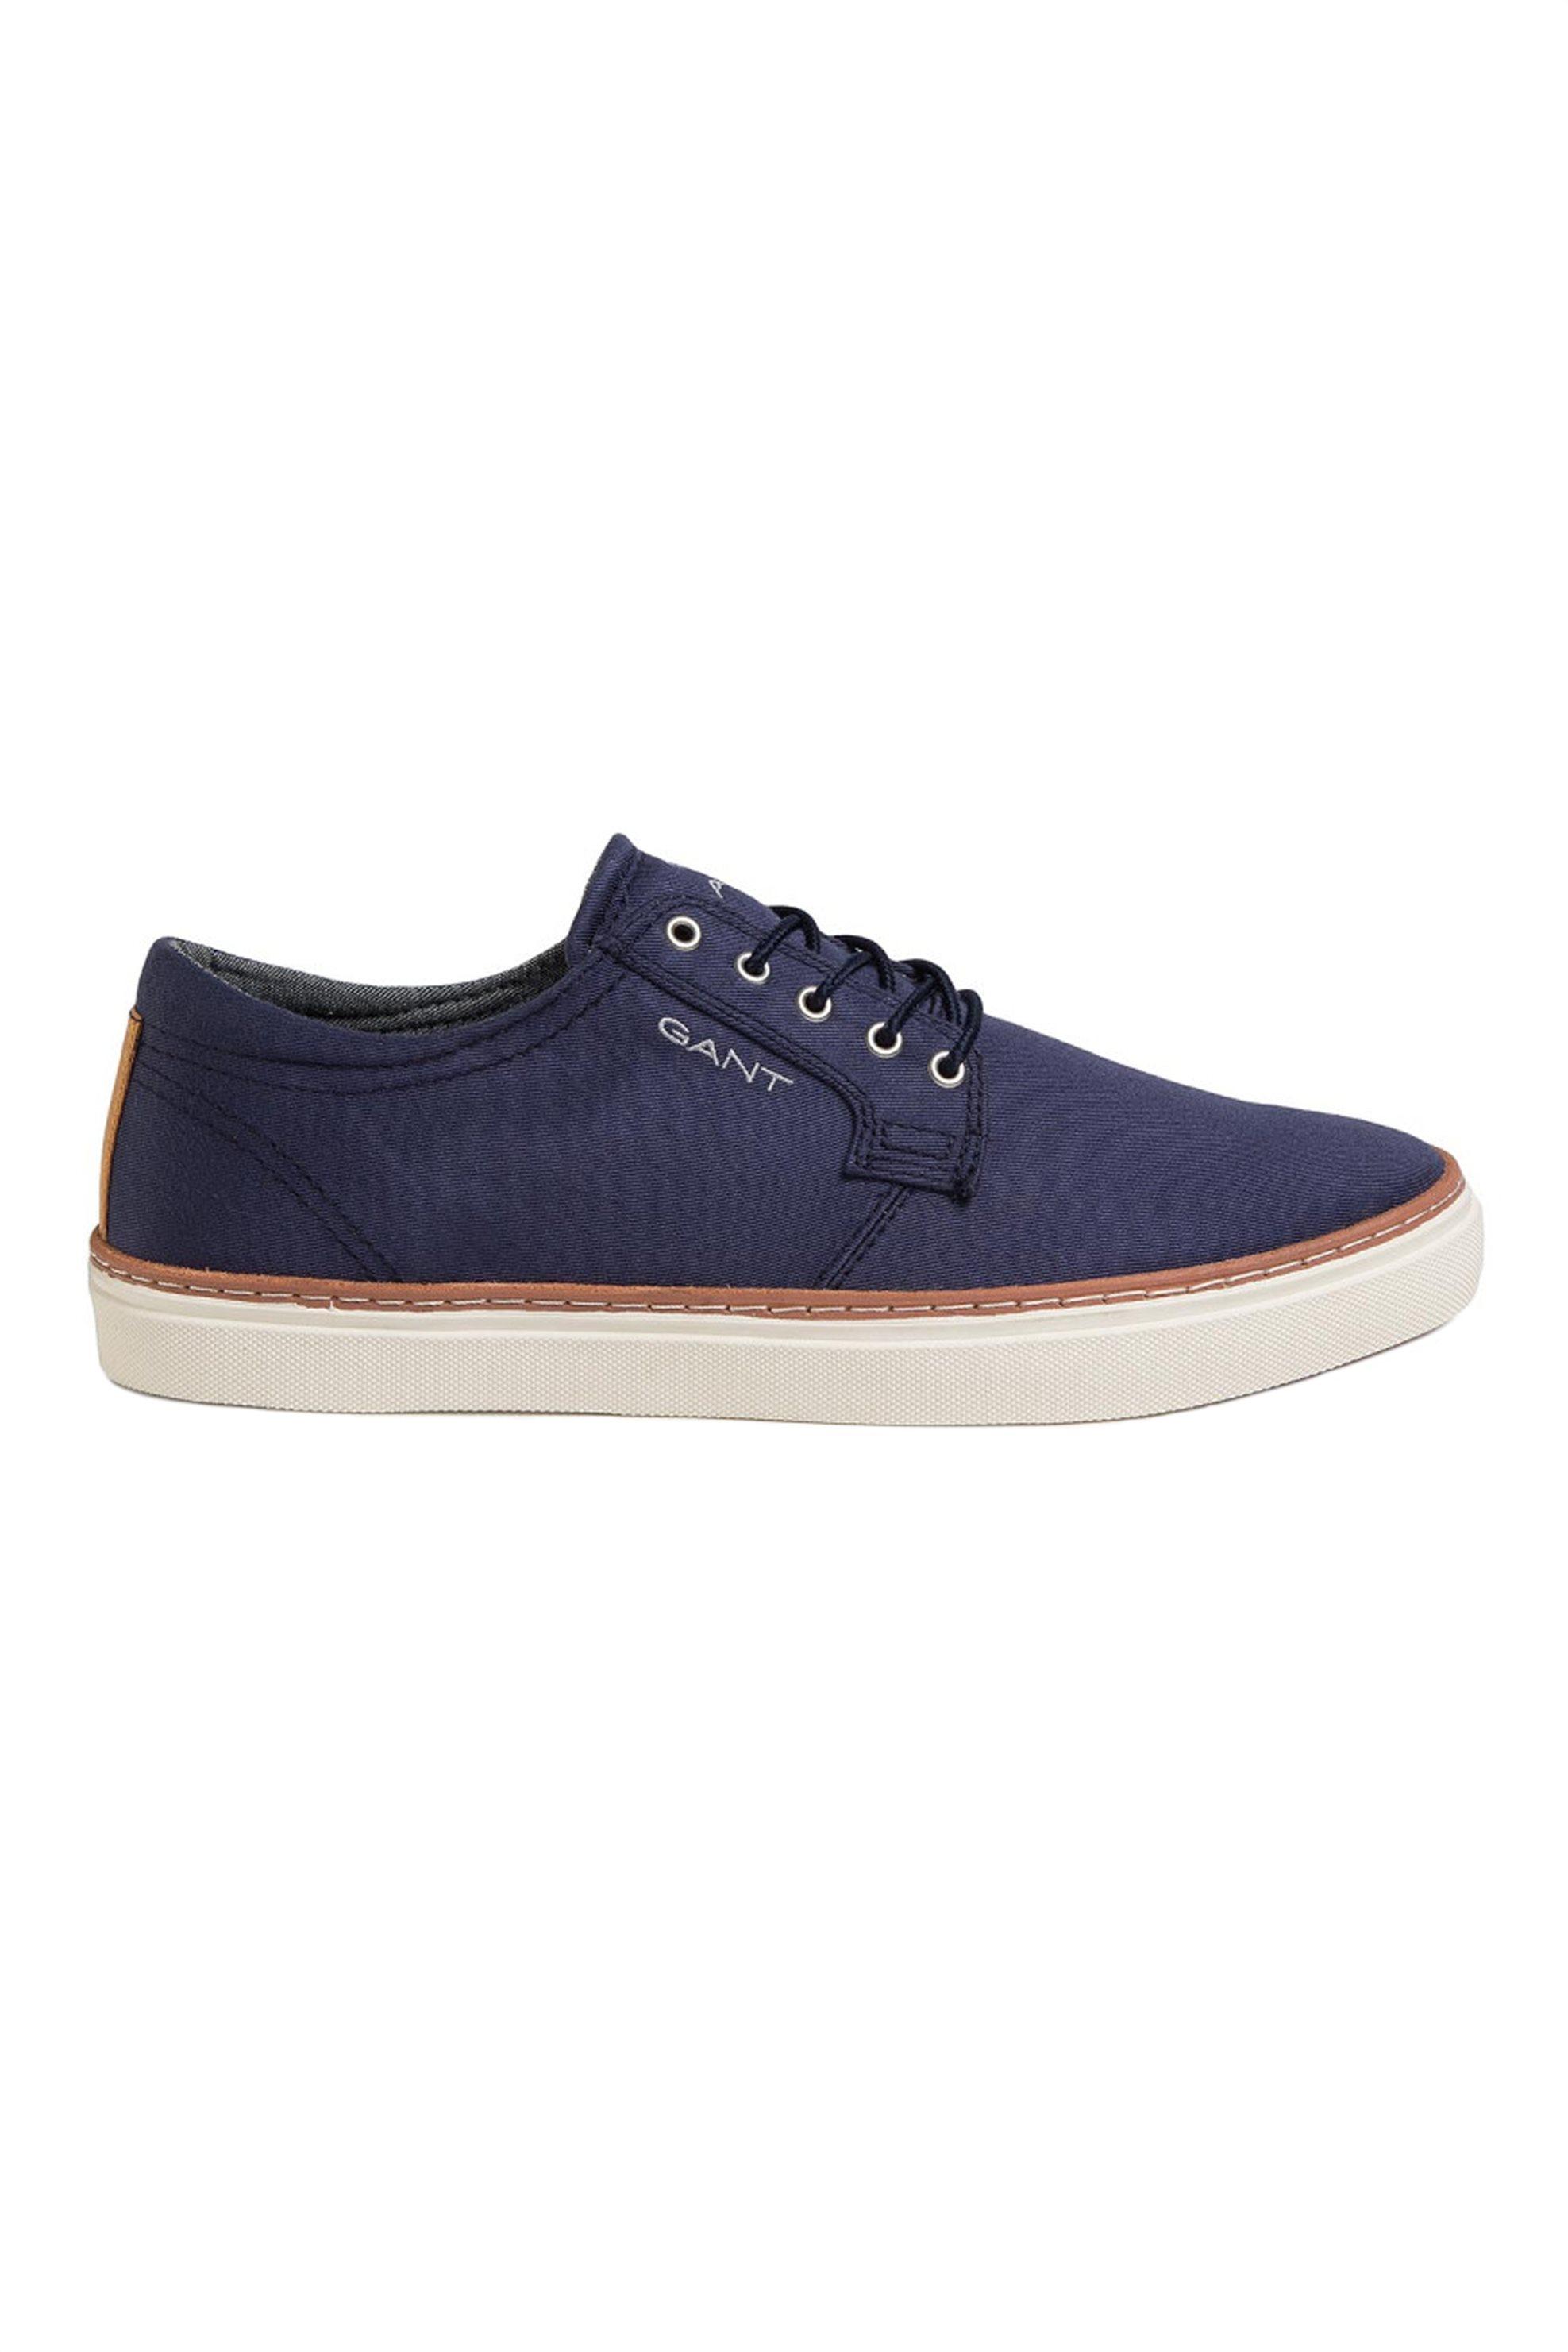 "Gant ανδρικά sneakers με κορδόνια ""Prepville"" – 20638496 – Μπλε Σκούρο"